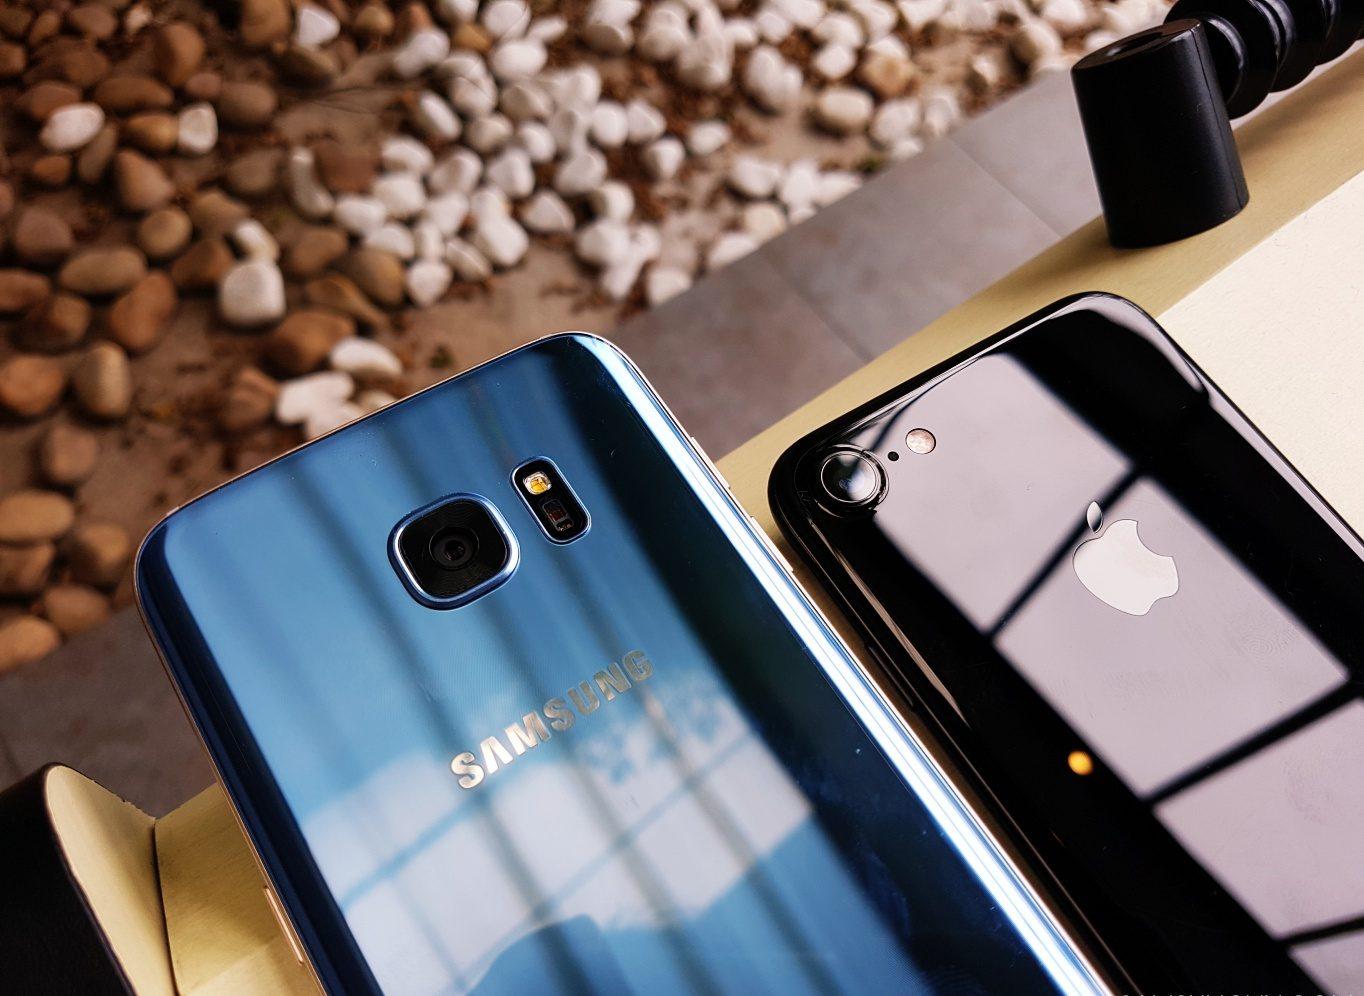 Galaxy S7 Edge Blue Coral và iPhone 7 Jet Black